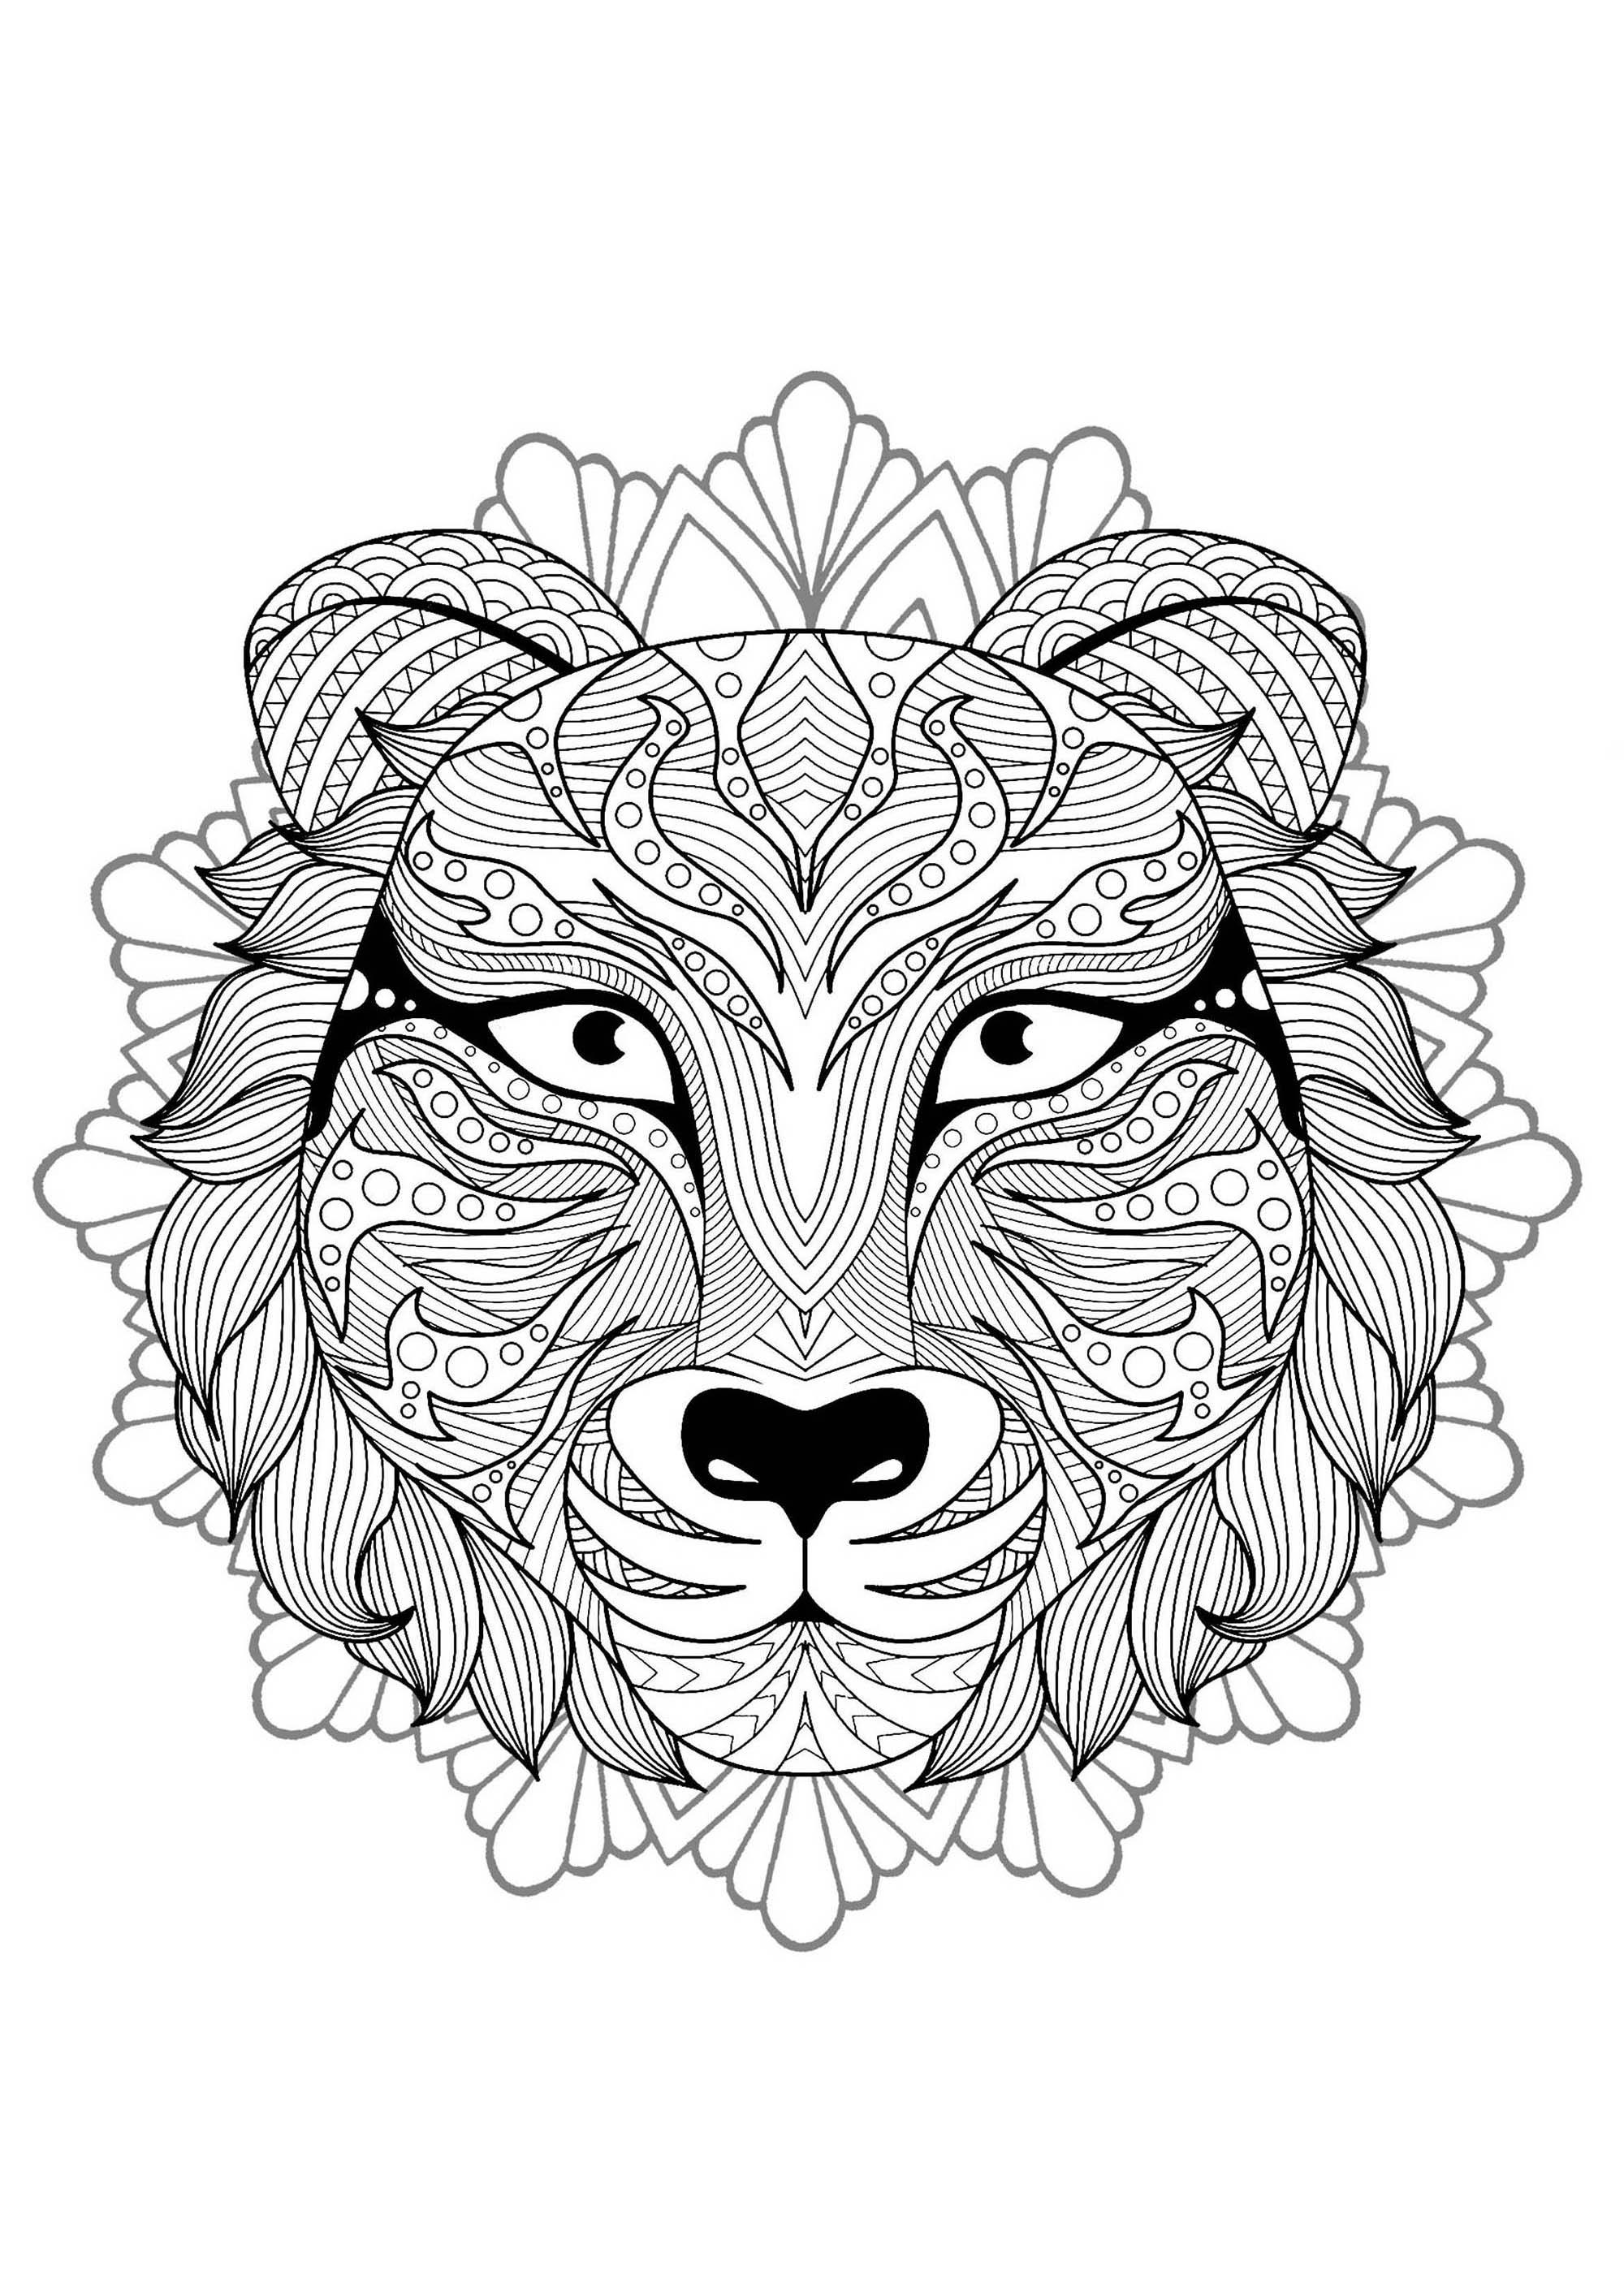 Mandala Tete Tigre 3 Mandalas Coloriages Difficiles